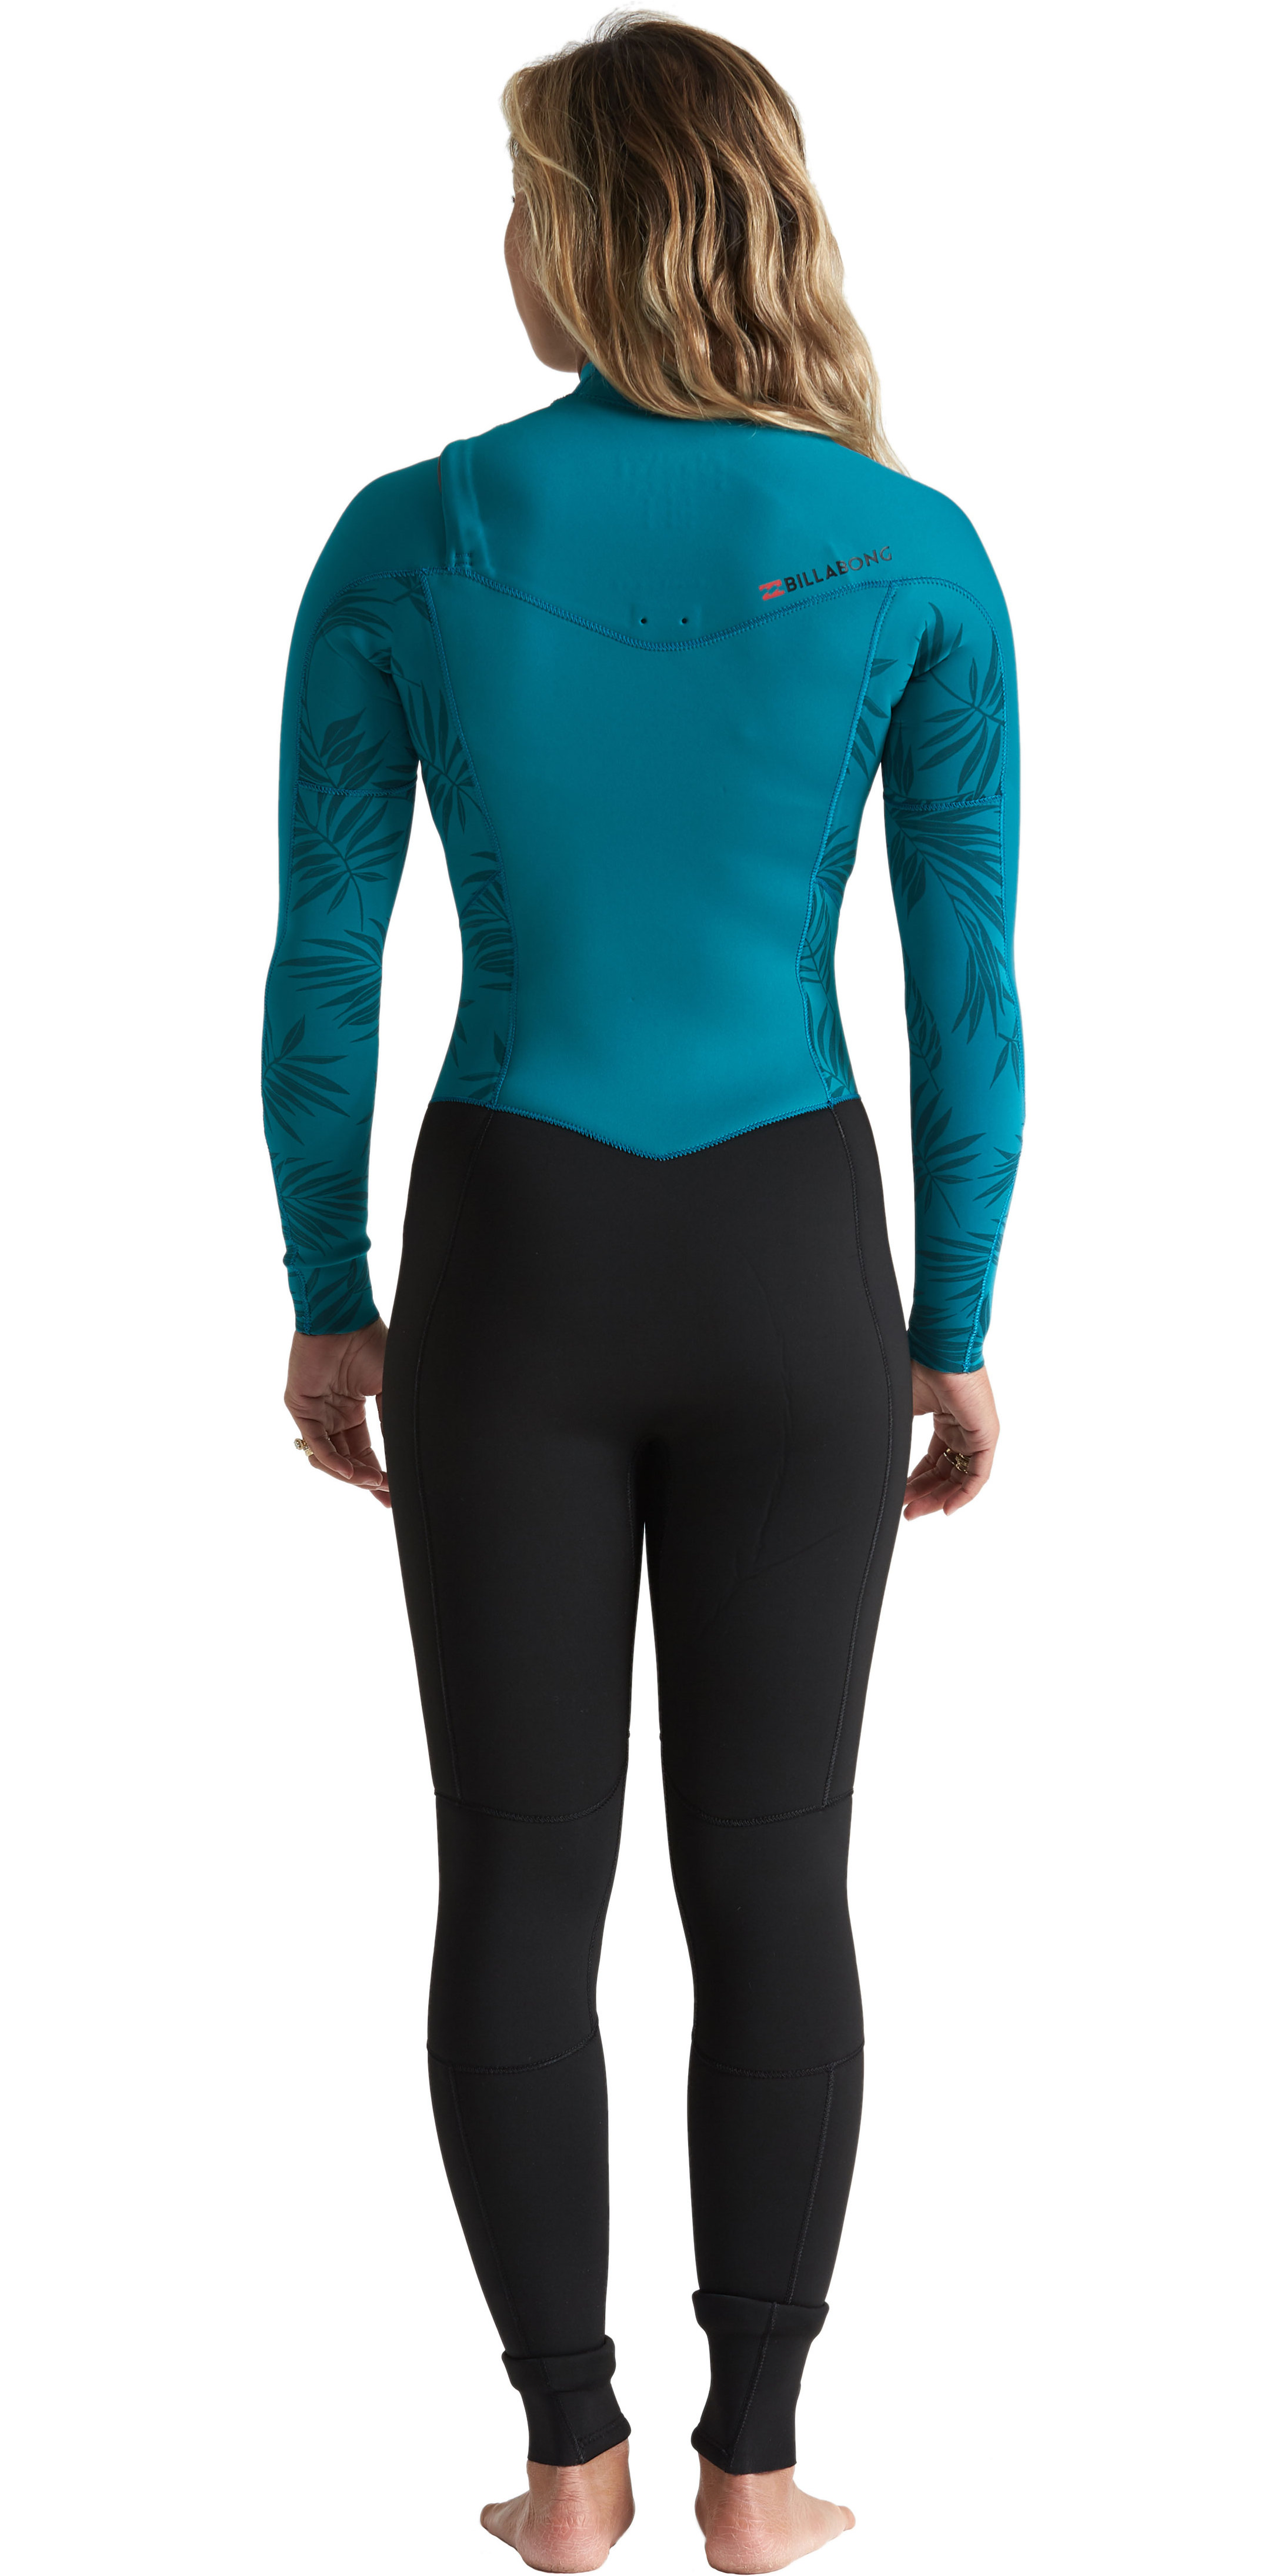 2020 Billabong Womens Furnace Synergy 4/3mm Chest Zip Wetsuit S44G52 - Mermaid